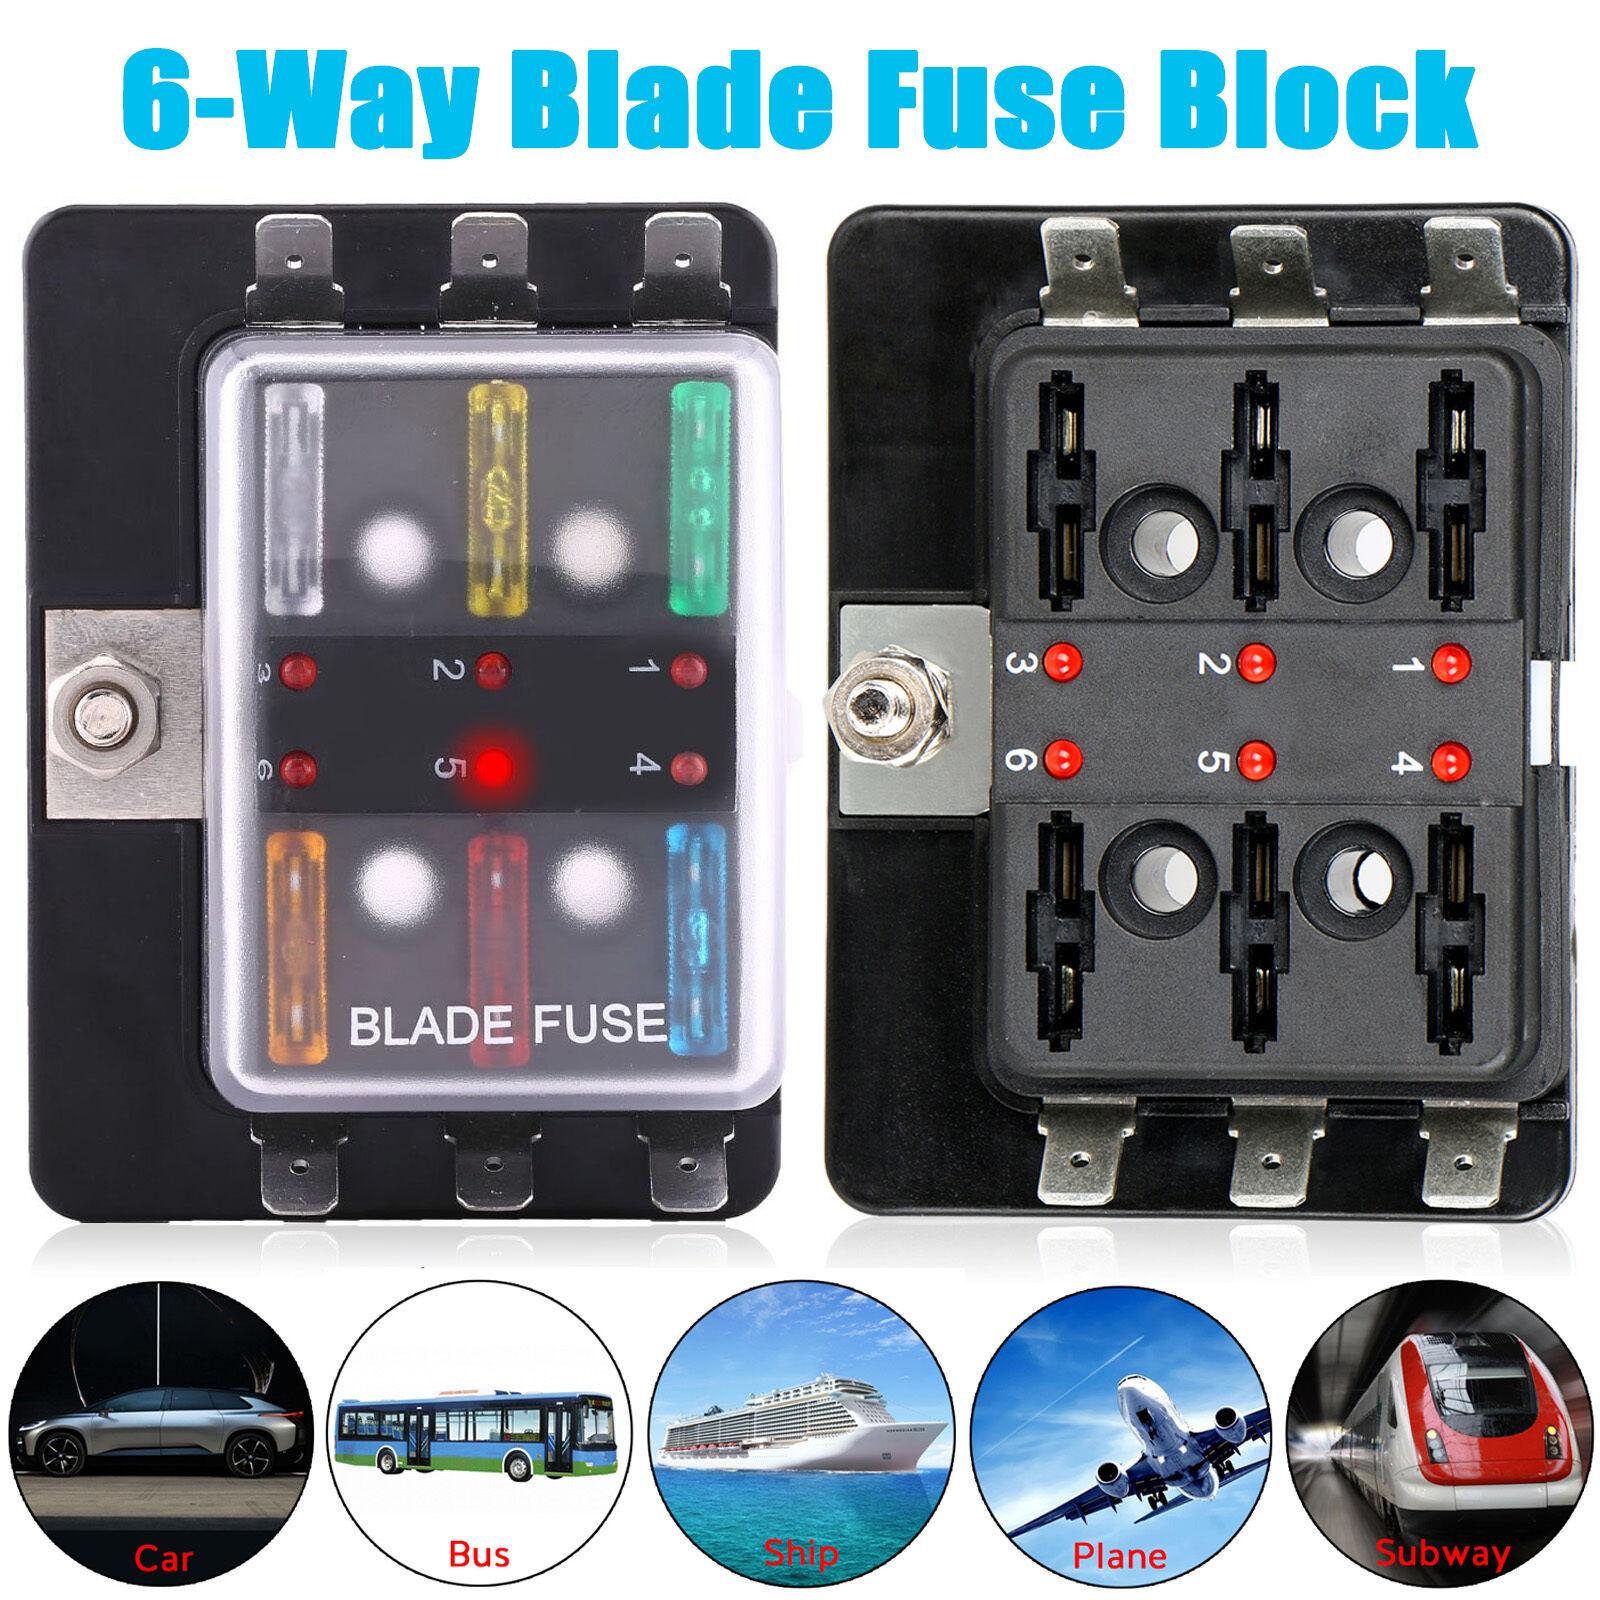 Fuse Box 10 Way Universal Car Boat Bus 12V Automotive Holder Blade Wiring Block